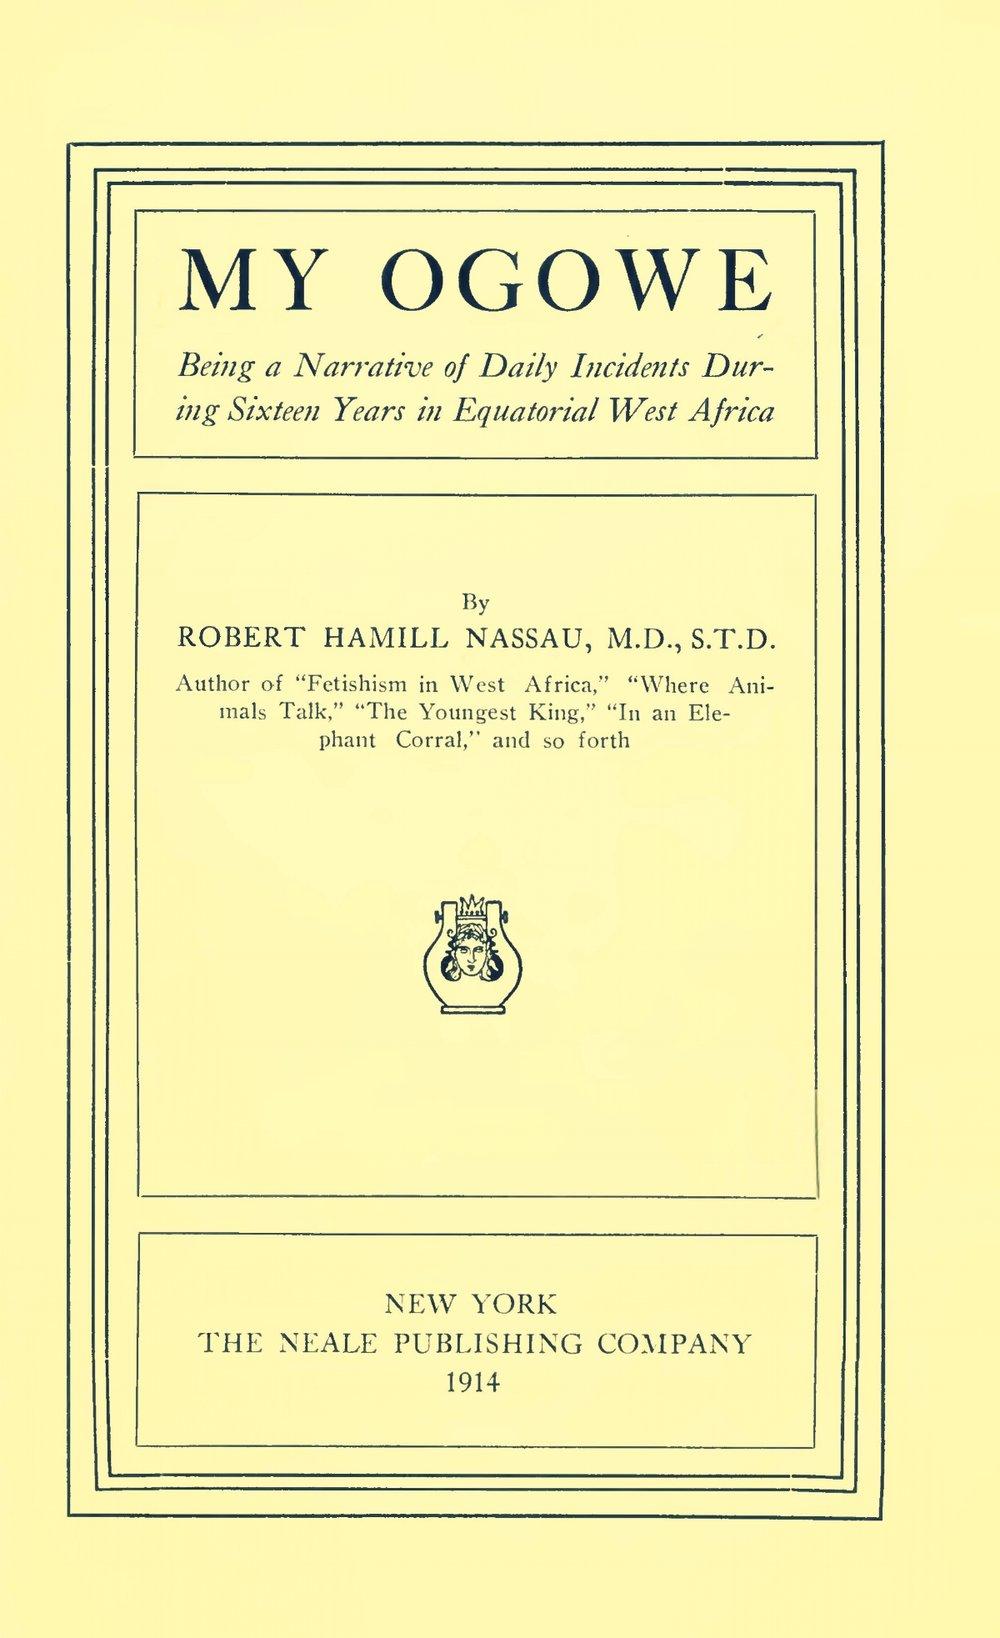 Nassau, Robert Hamill, My Ogowe Title Page.jpg